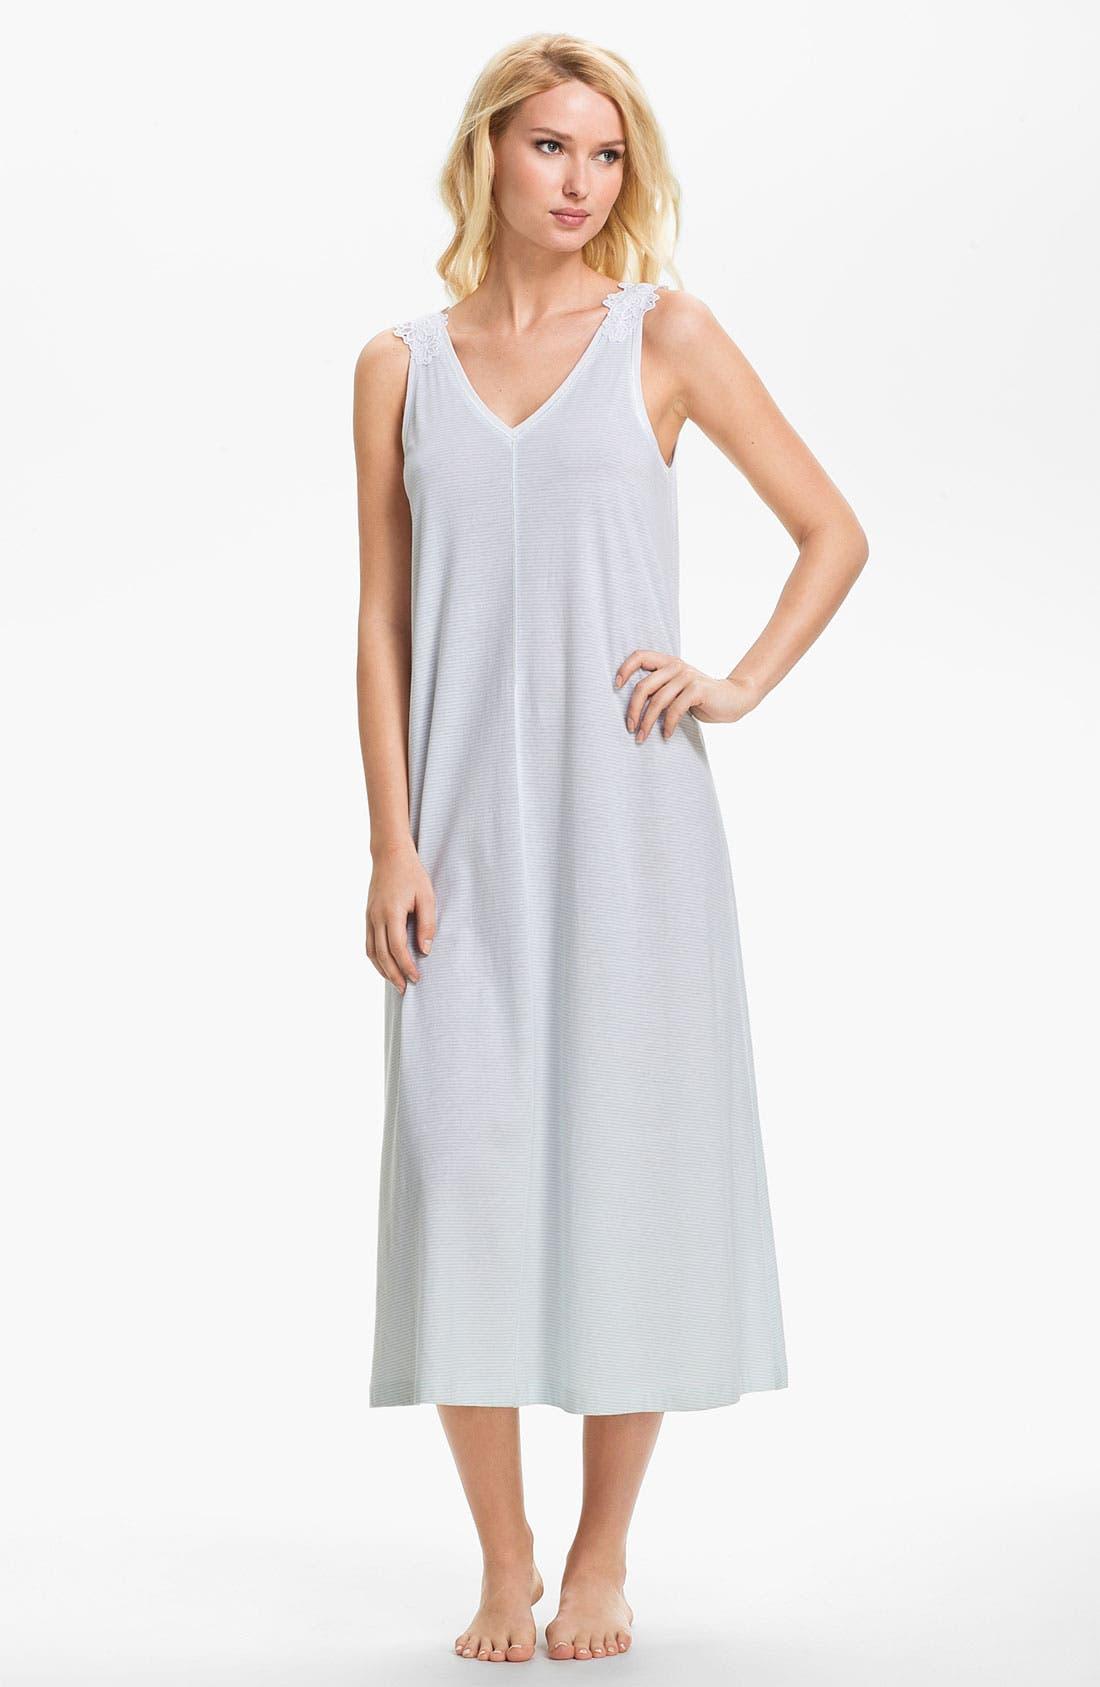 Main Image - Carole Hochman Designs Sleeveless Nightgown